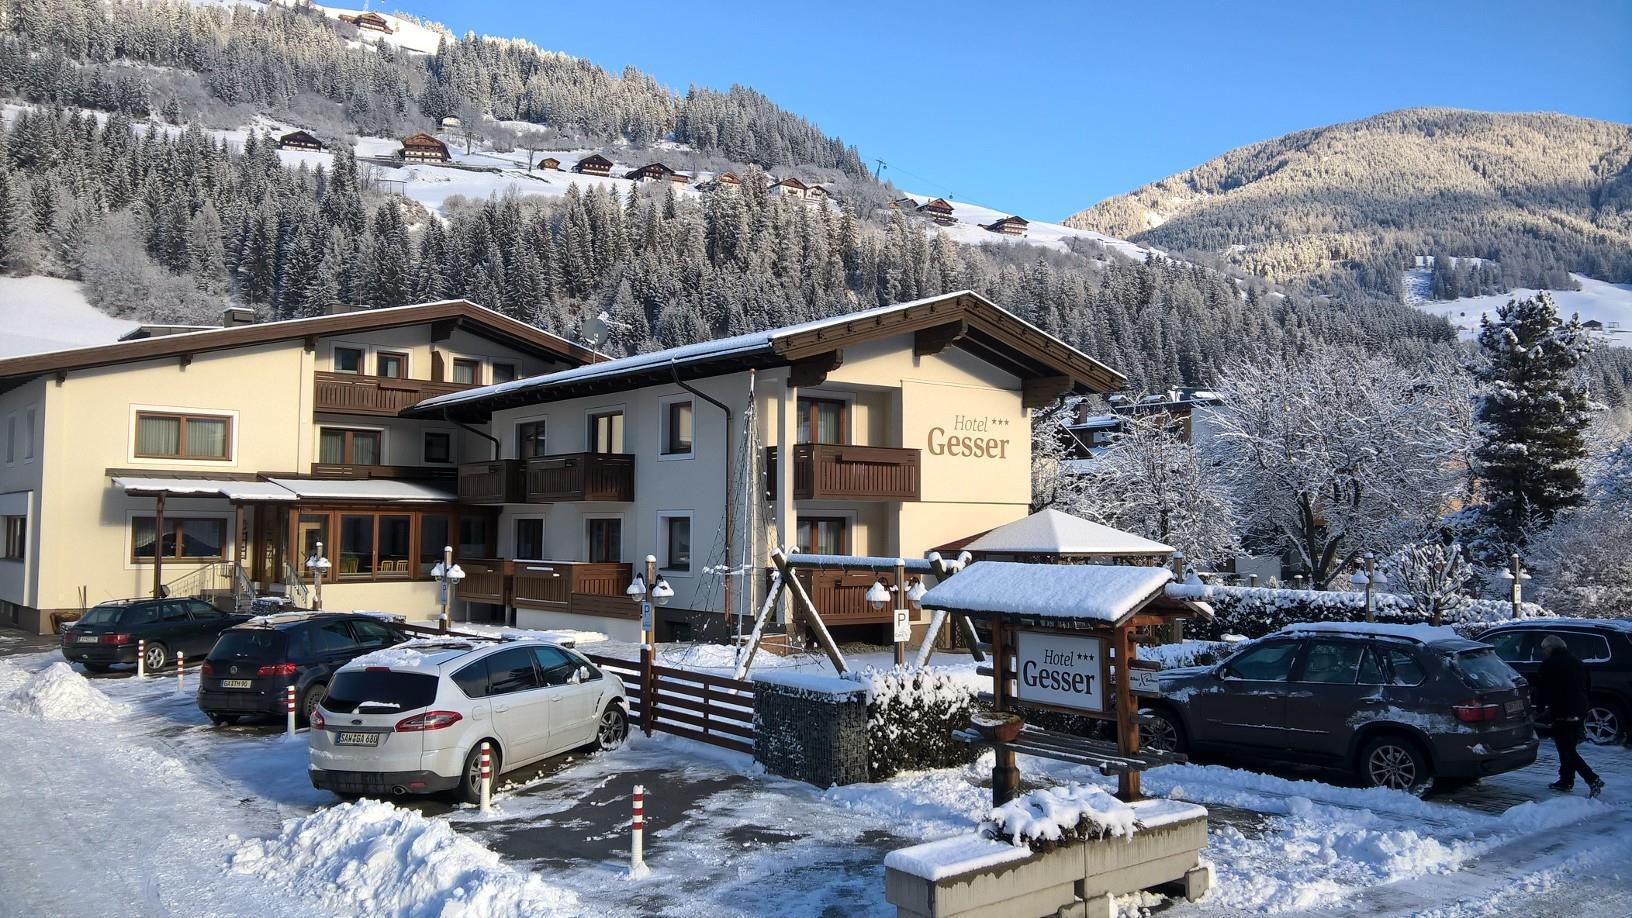 Winteransicht-Hotel-GESSER-Sillian-Hochpustertal.jpg